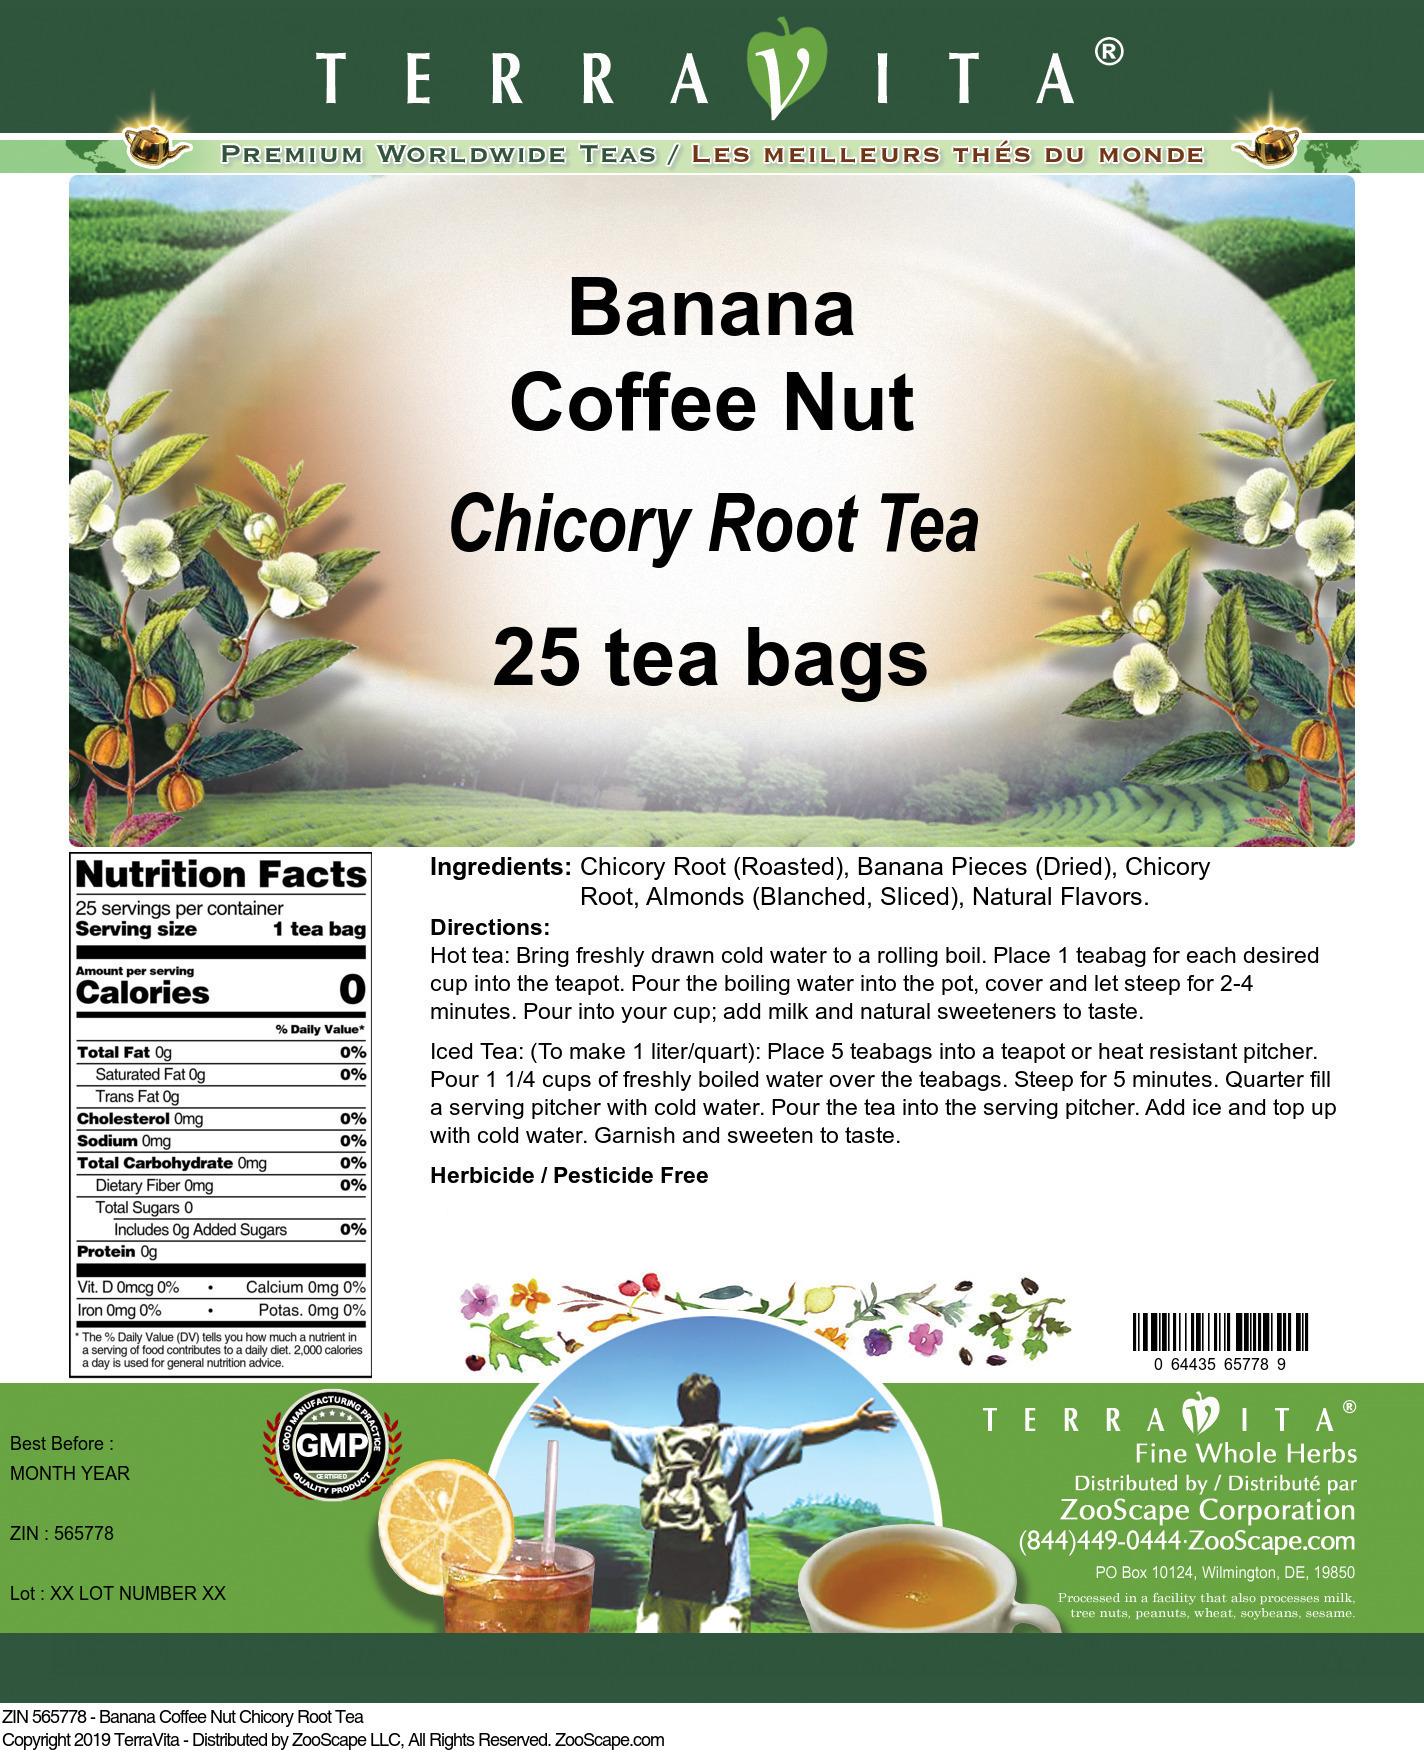 Banana Coffee Nut Chicory Root Tea